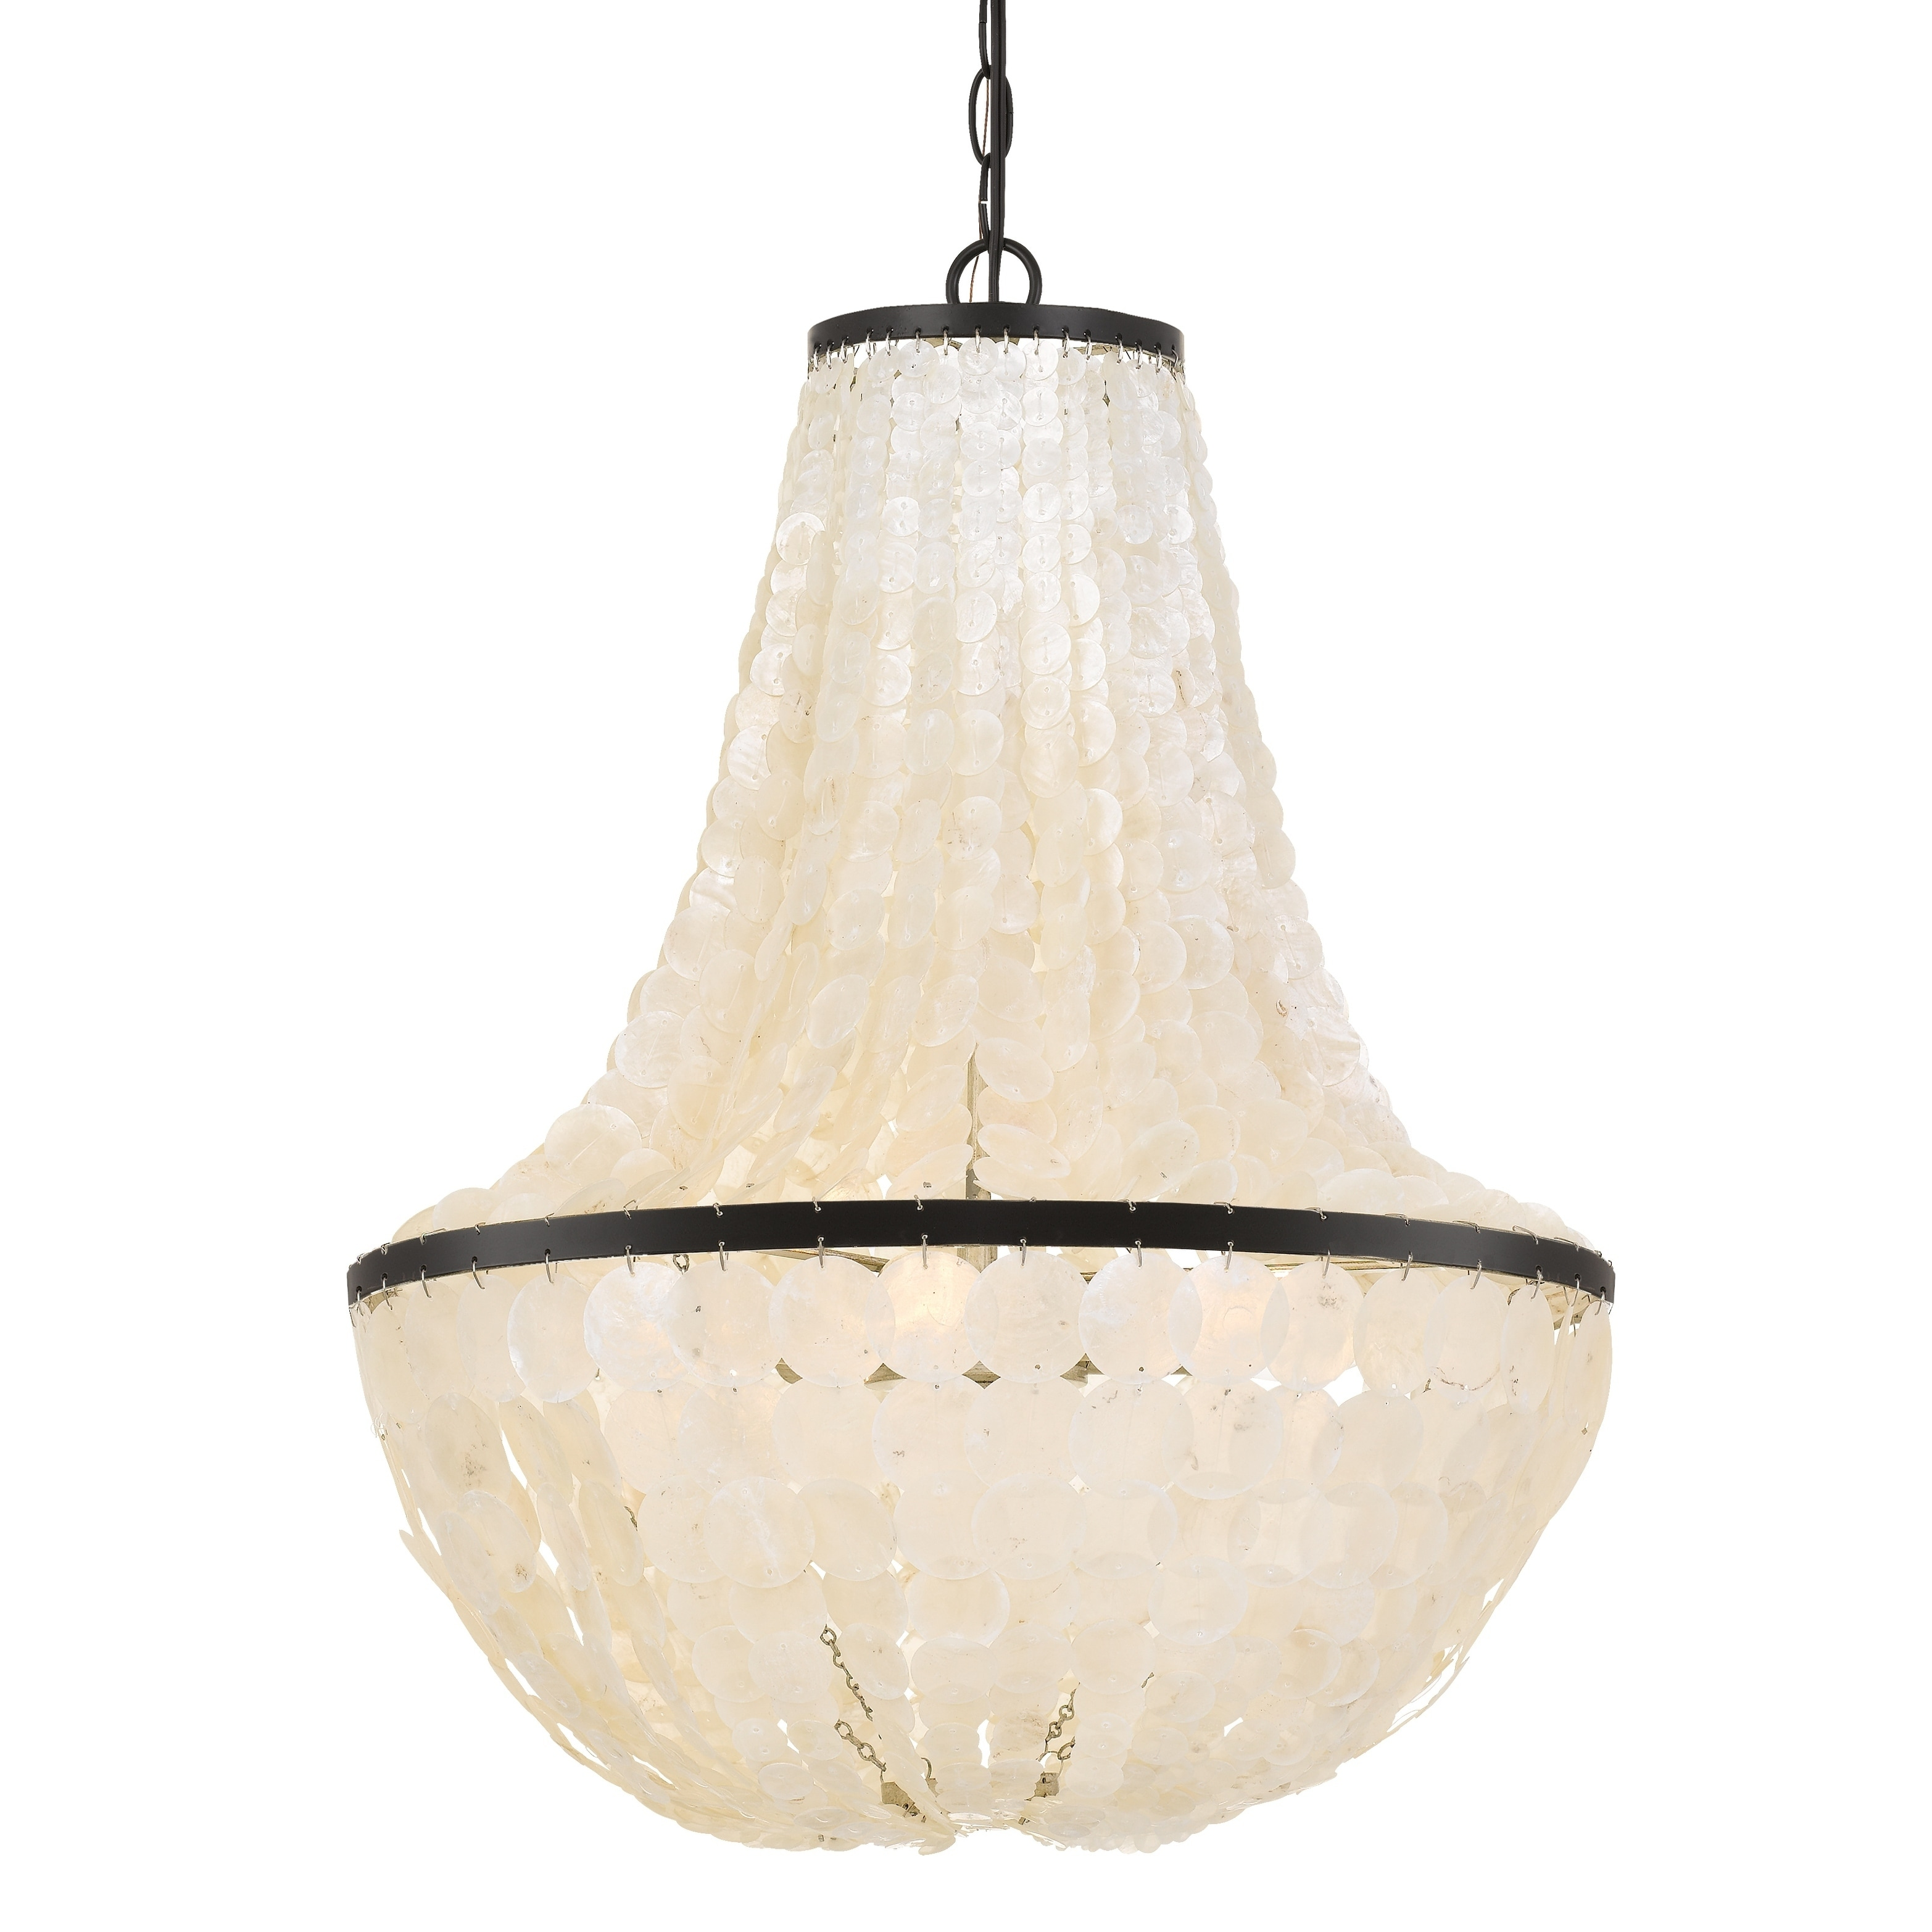 Shop Black Friday Deals On Brielle 6 Light Dark Bronze Capiz Shell Chandelier Overstock 28711964